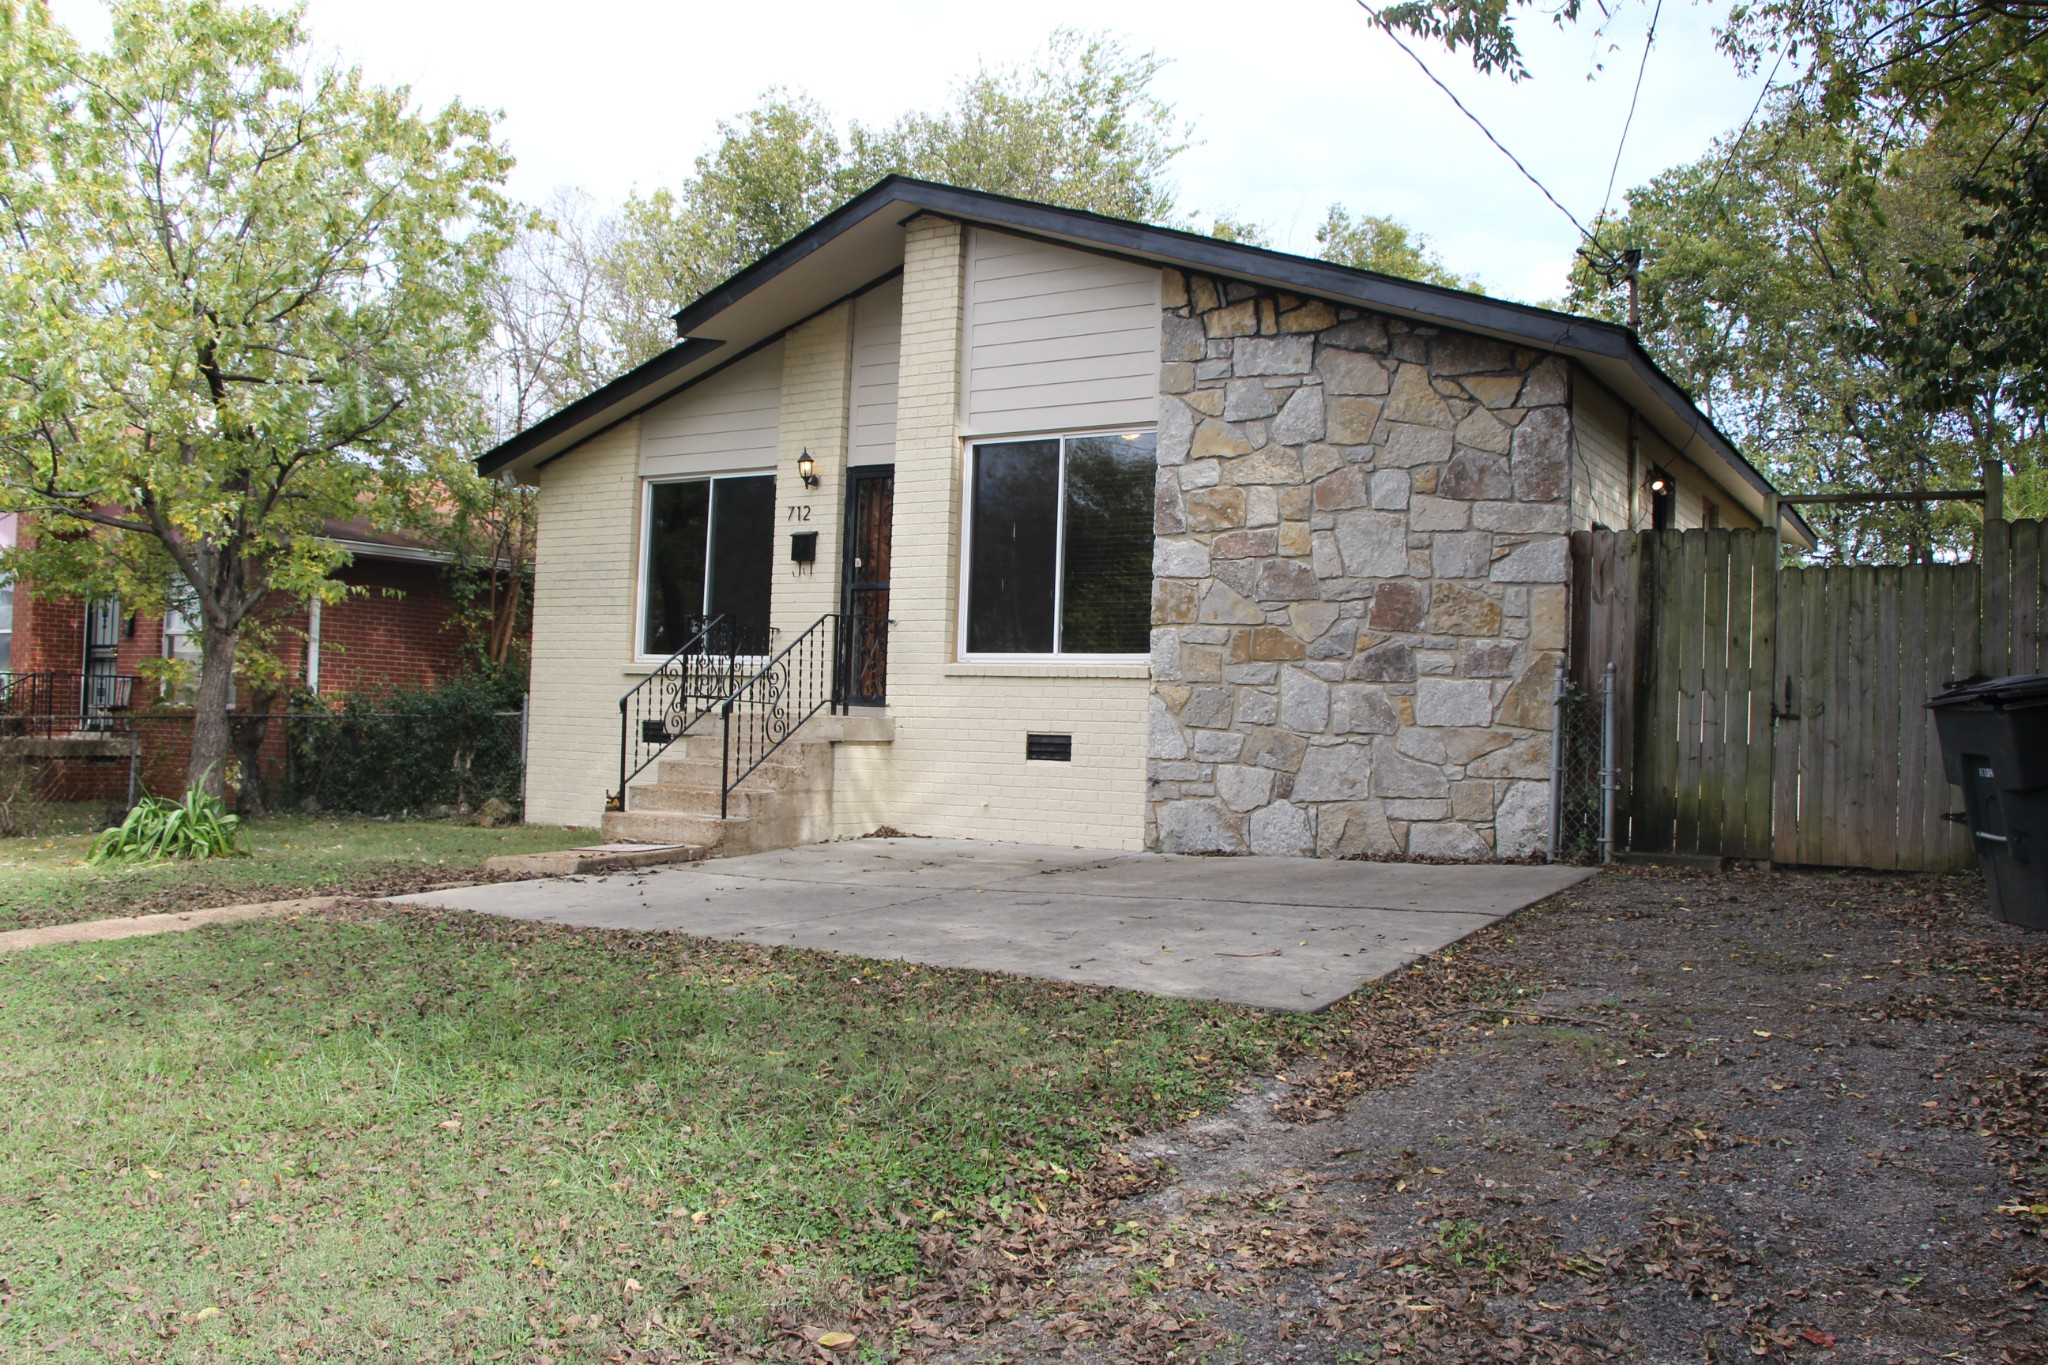 712 14th Ave, S Property Photo - Nashville, TN real estate listing